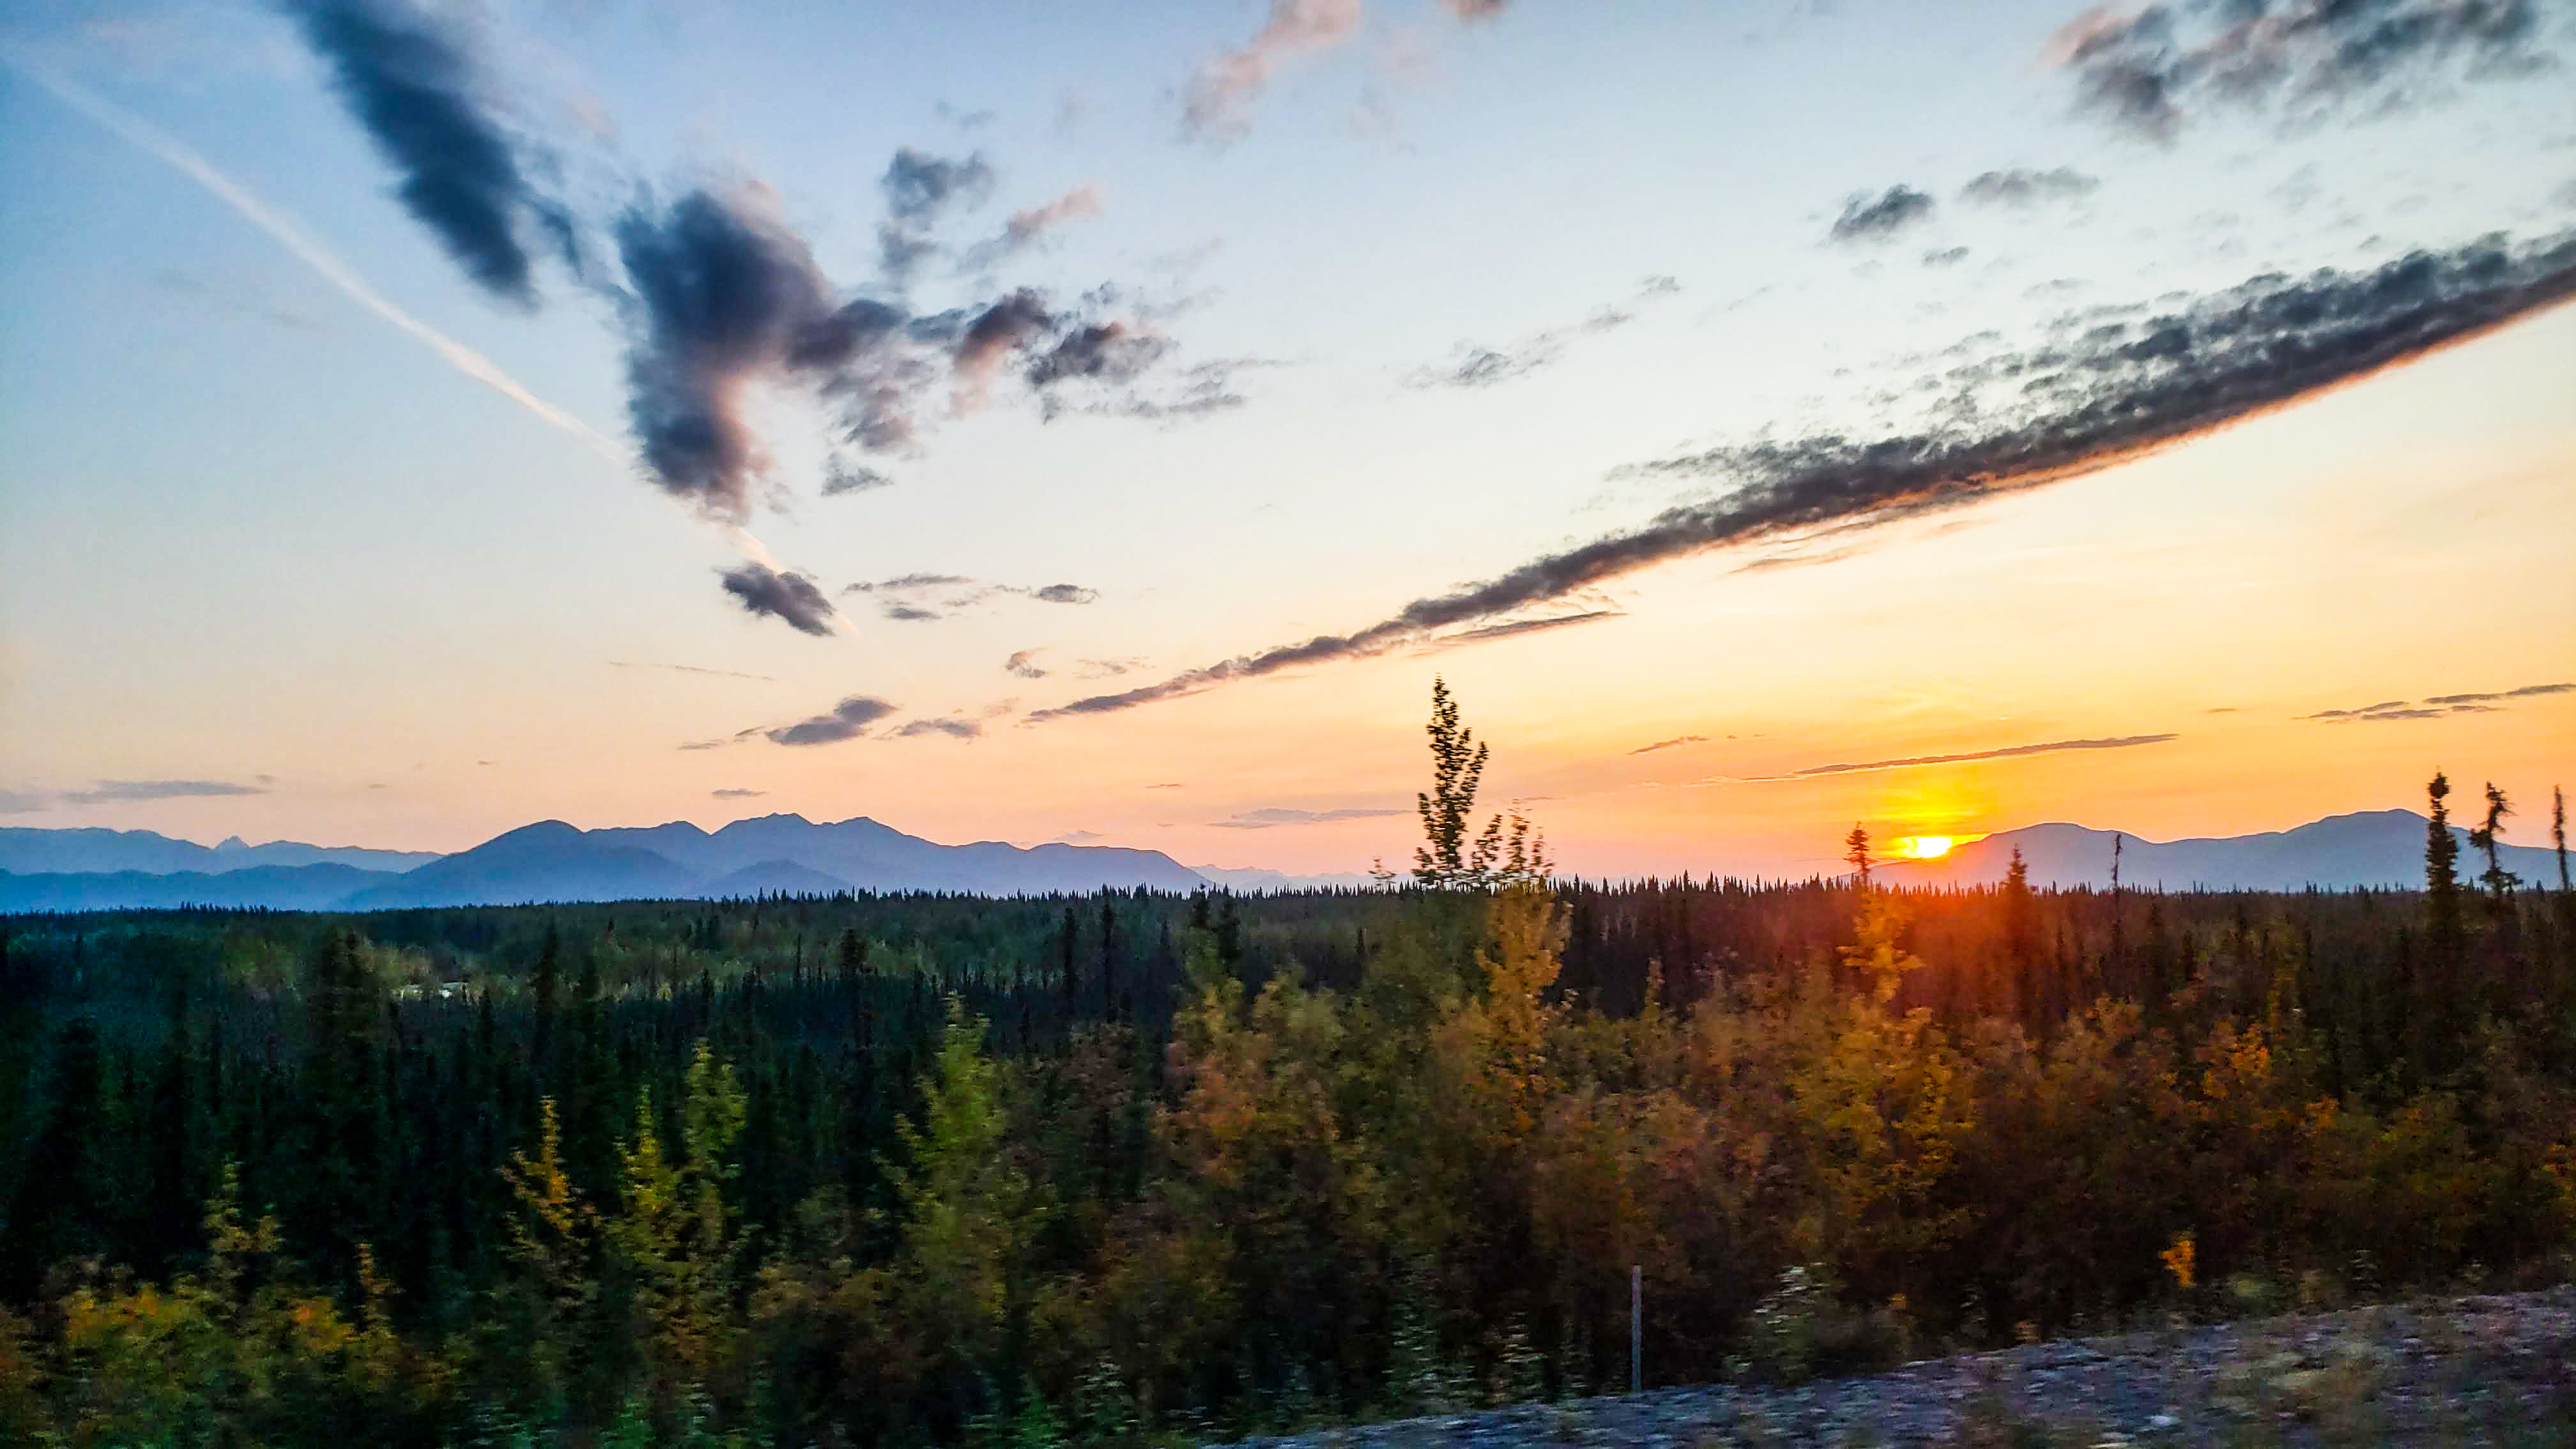 Our last Alaska Sunset